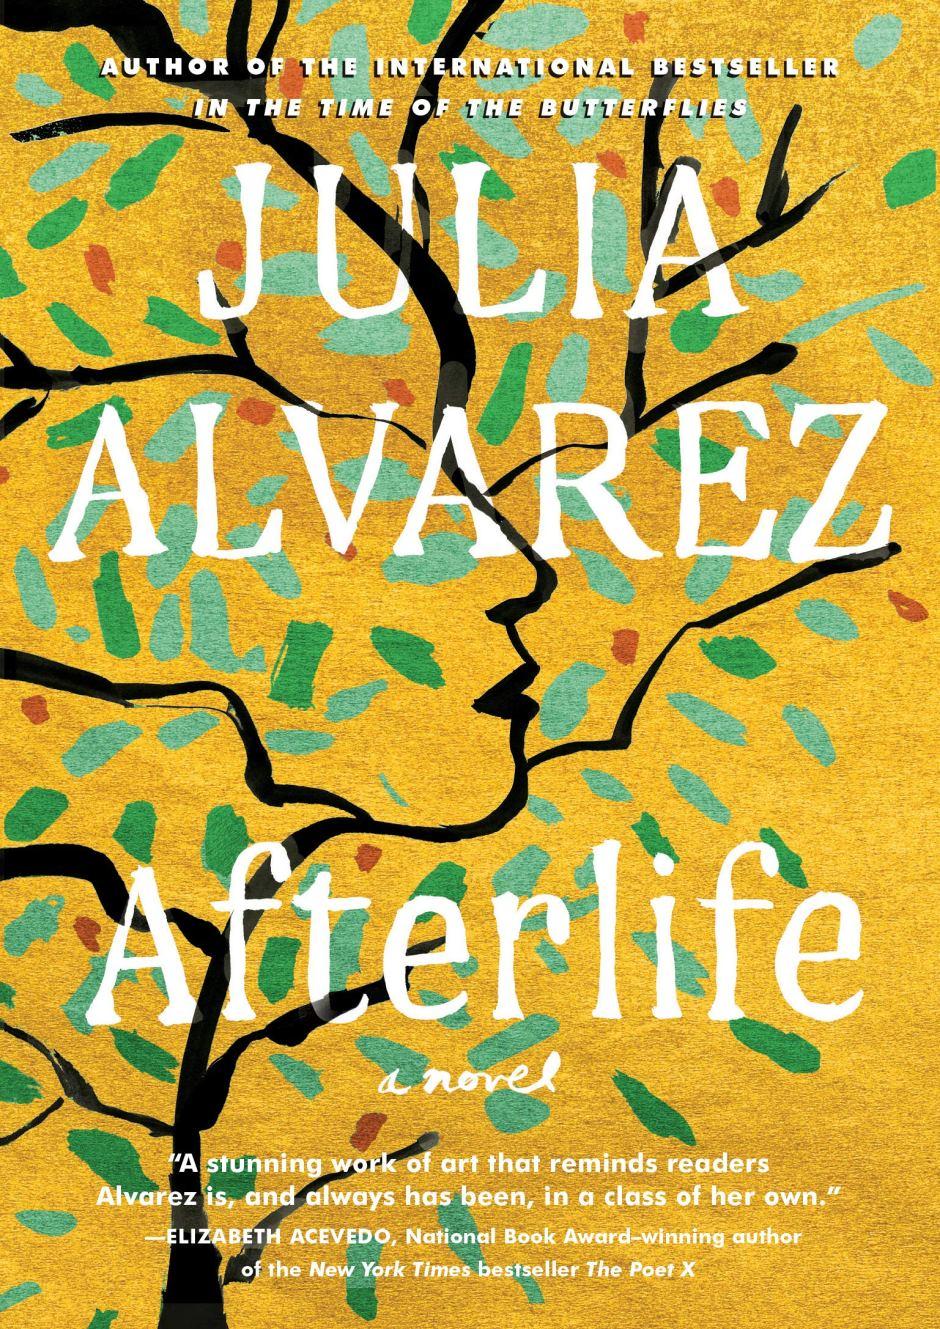 Afterlife: Amazon.co.uk: Alvarez, Julia: 9781643750255: Books